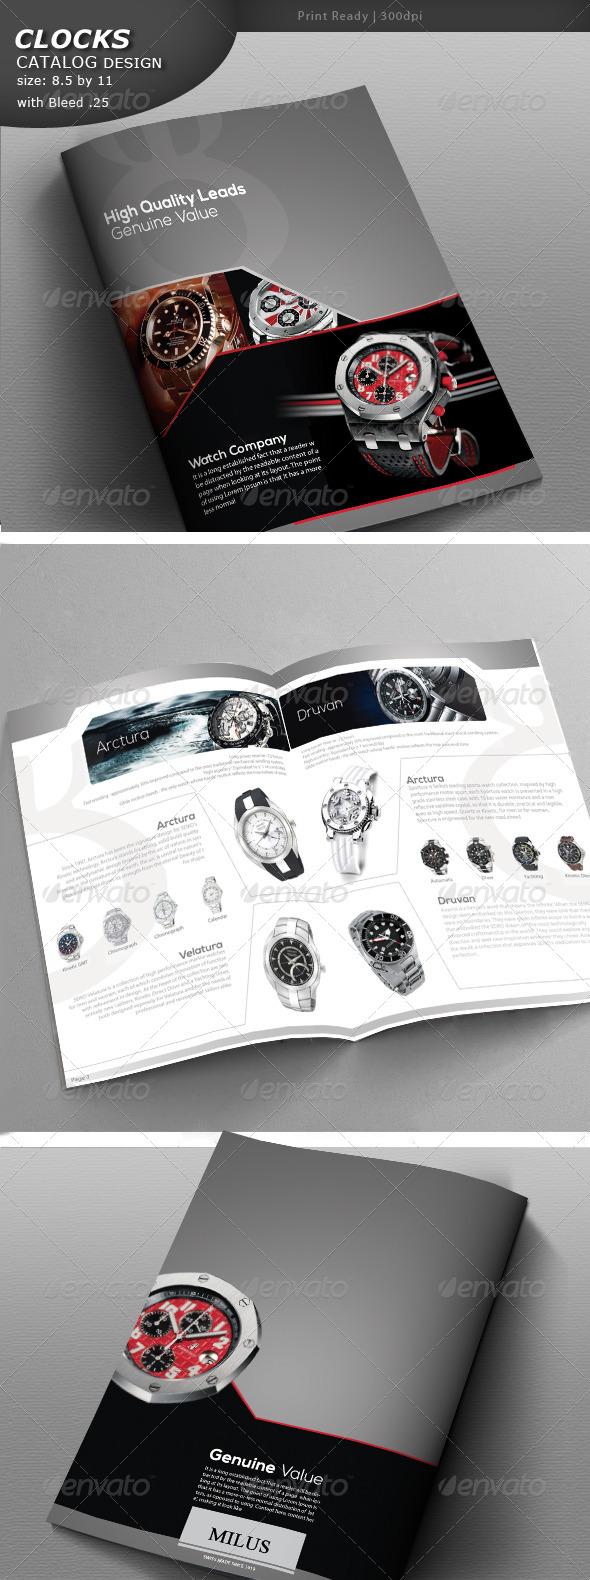 Clock Catalog - Catalogs Brochures